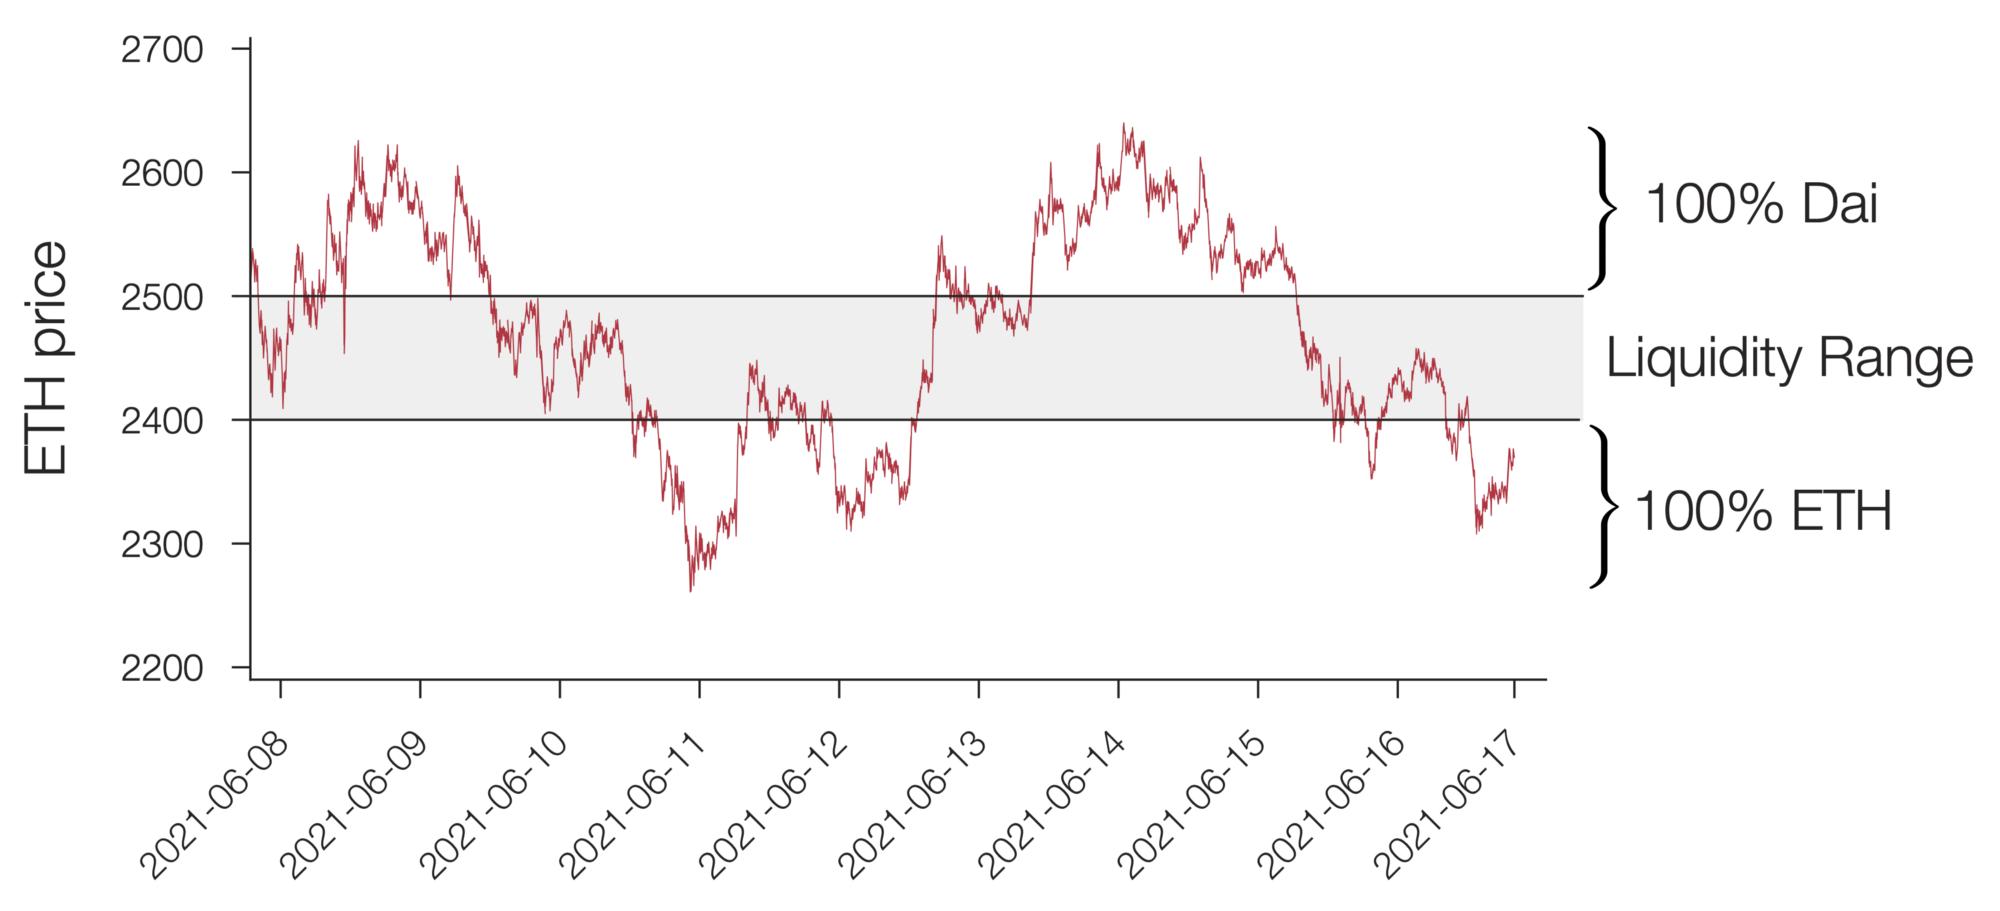 DeFi之道丨Uniswap V3 LP与传统永久看涨看跌期权的相似之处